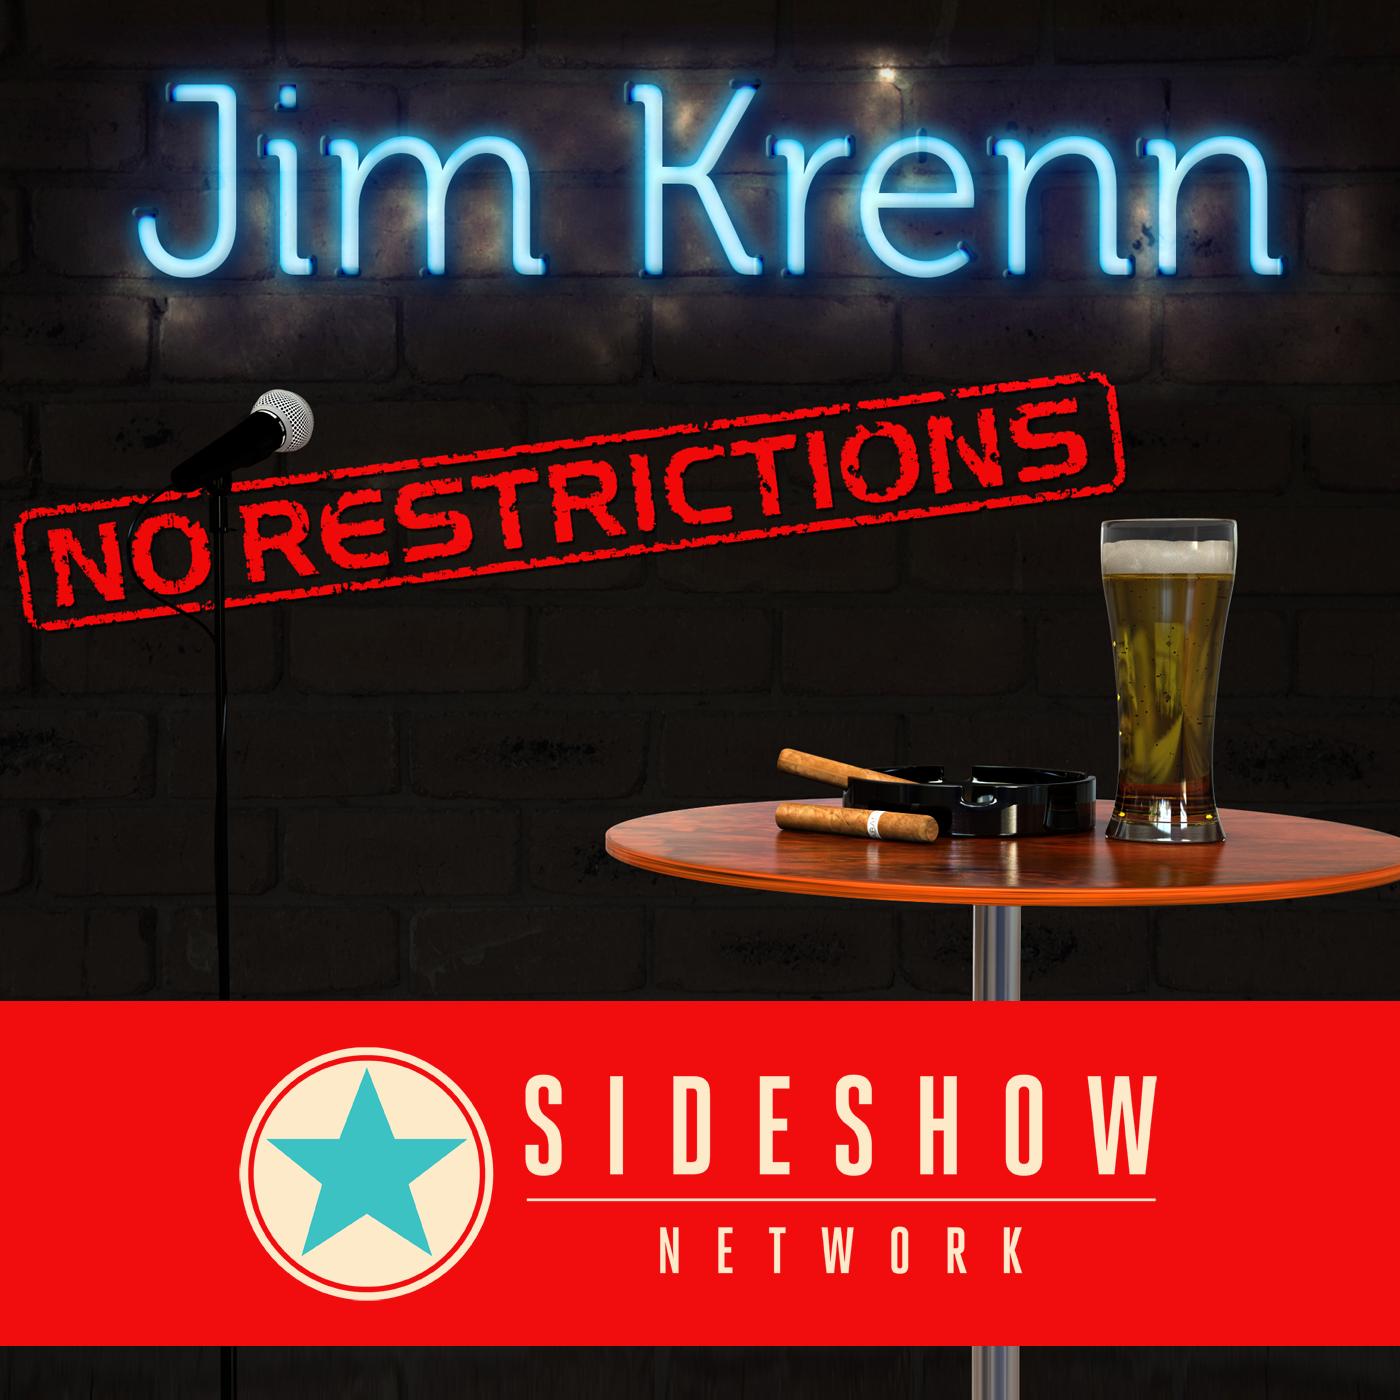 Jim Krenn, Jim Krenn: No Restrictions, Sideshow Network, Podcast entertainment, talent network